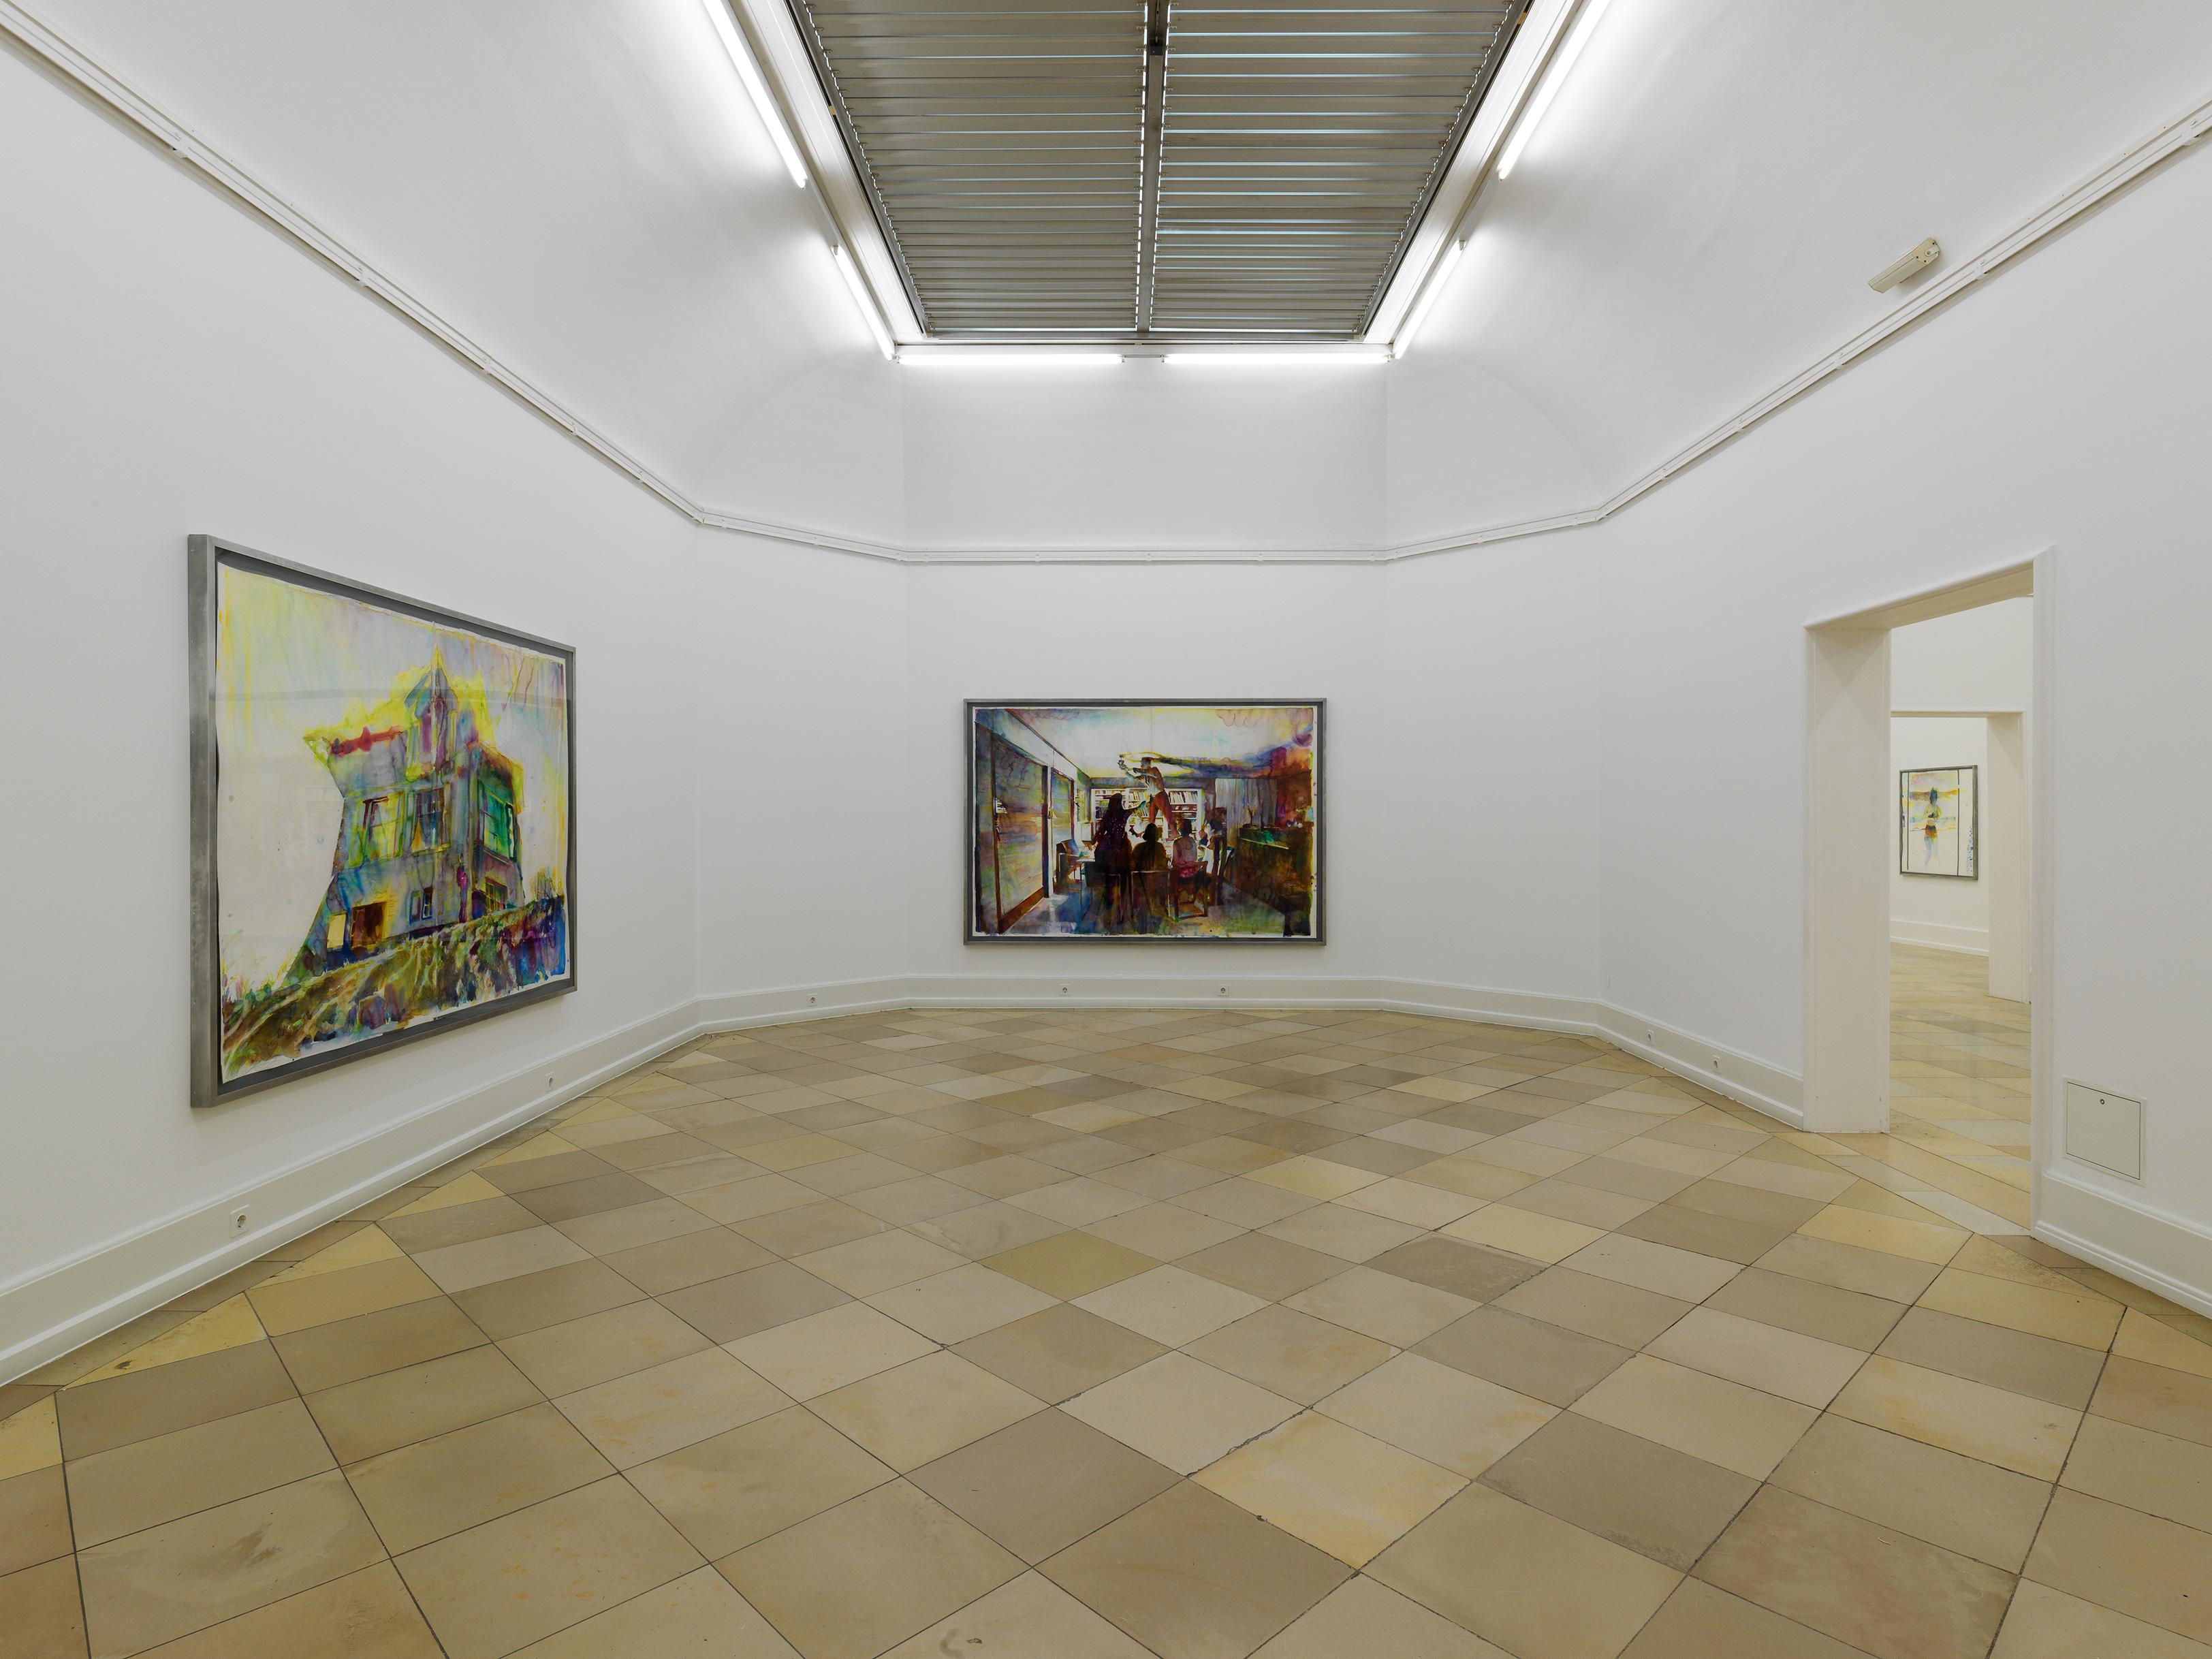 Galerie Barbara Thumm \ Martin Dammann – Zum Resultat beruhigter Tumult